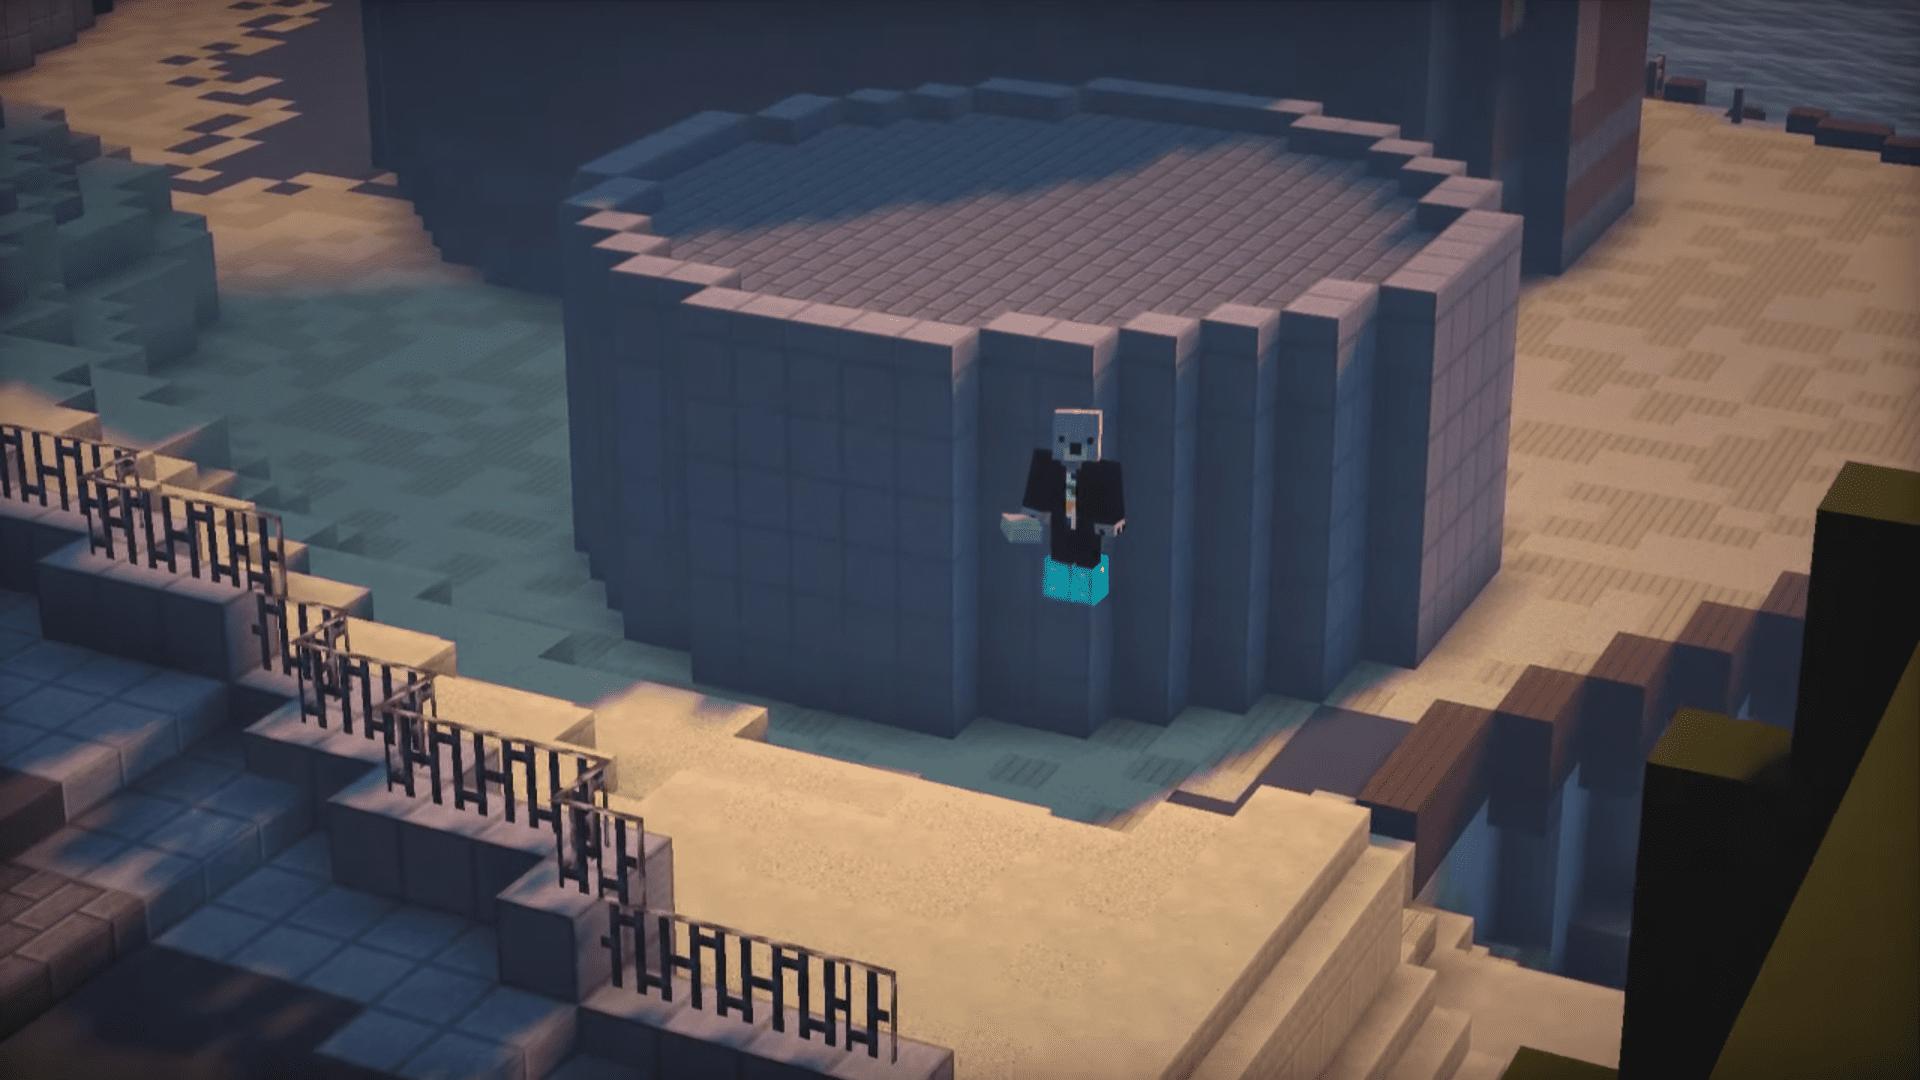 gta minecraft server ip